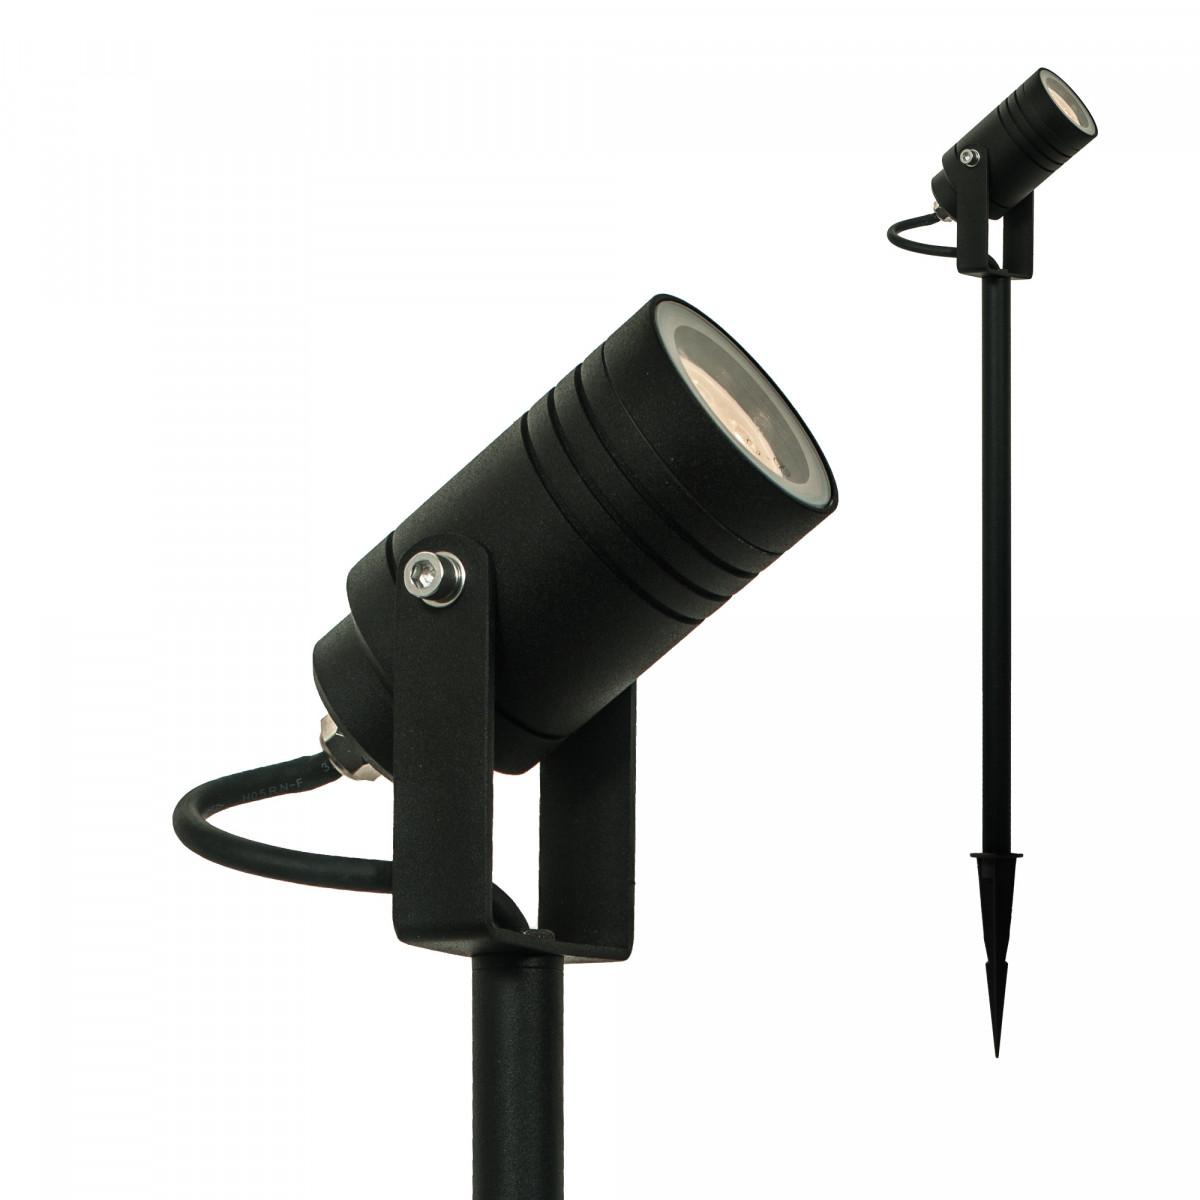 Beamy Black Large - Gartenstrahler - Trendige Fußwegbeleuchtung